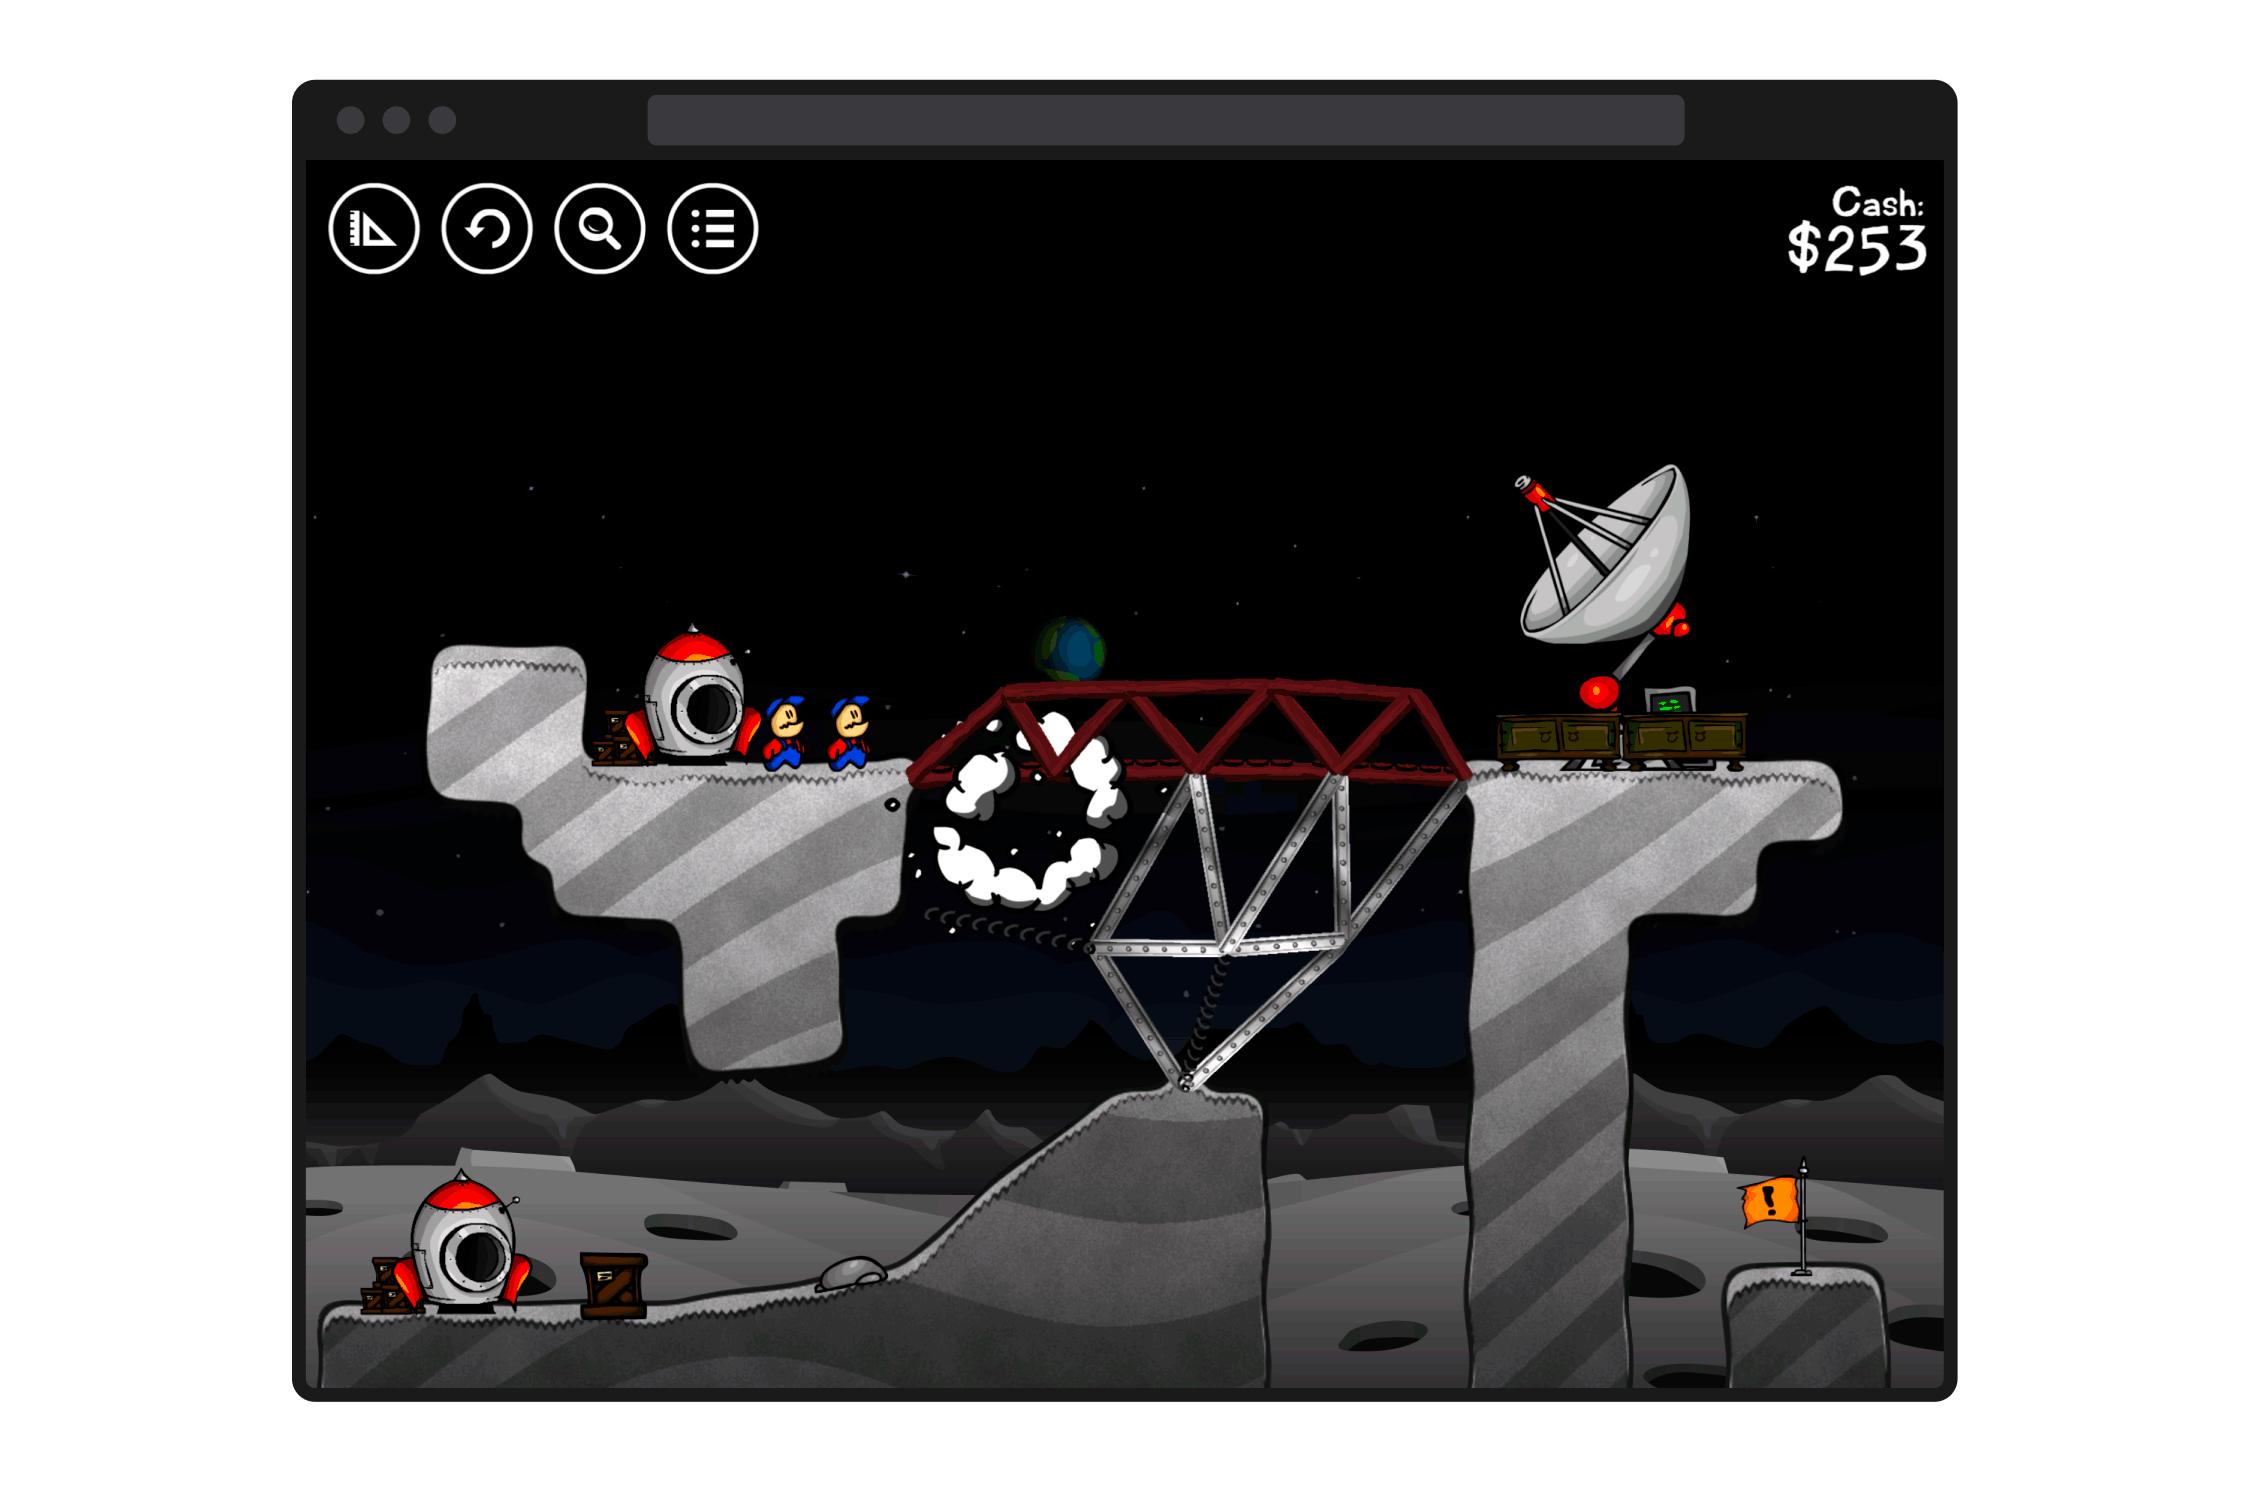 Gameplay screen for Cargo Bridge